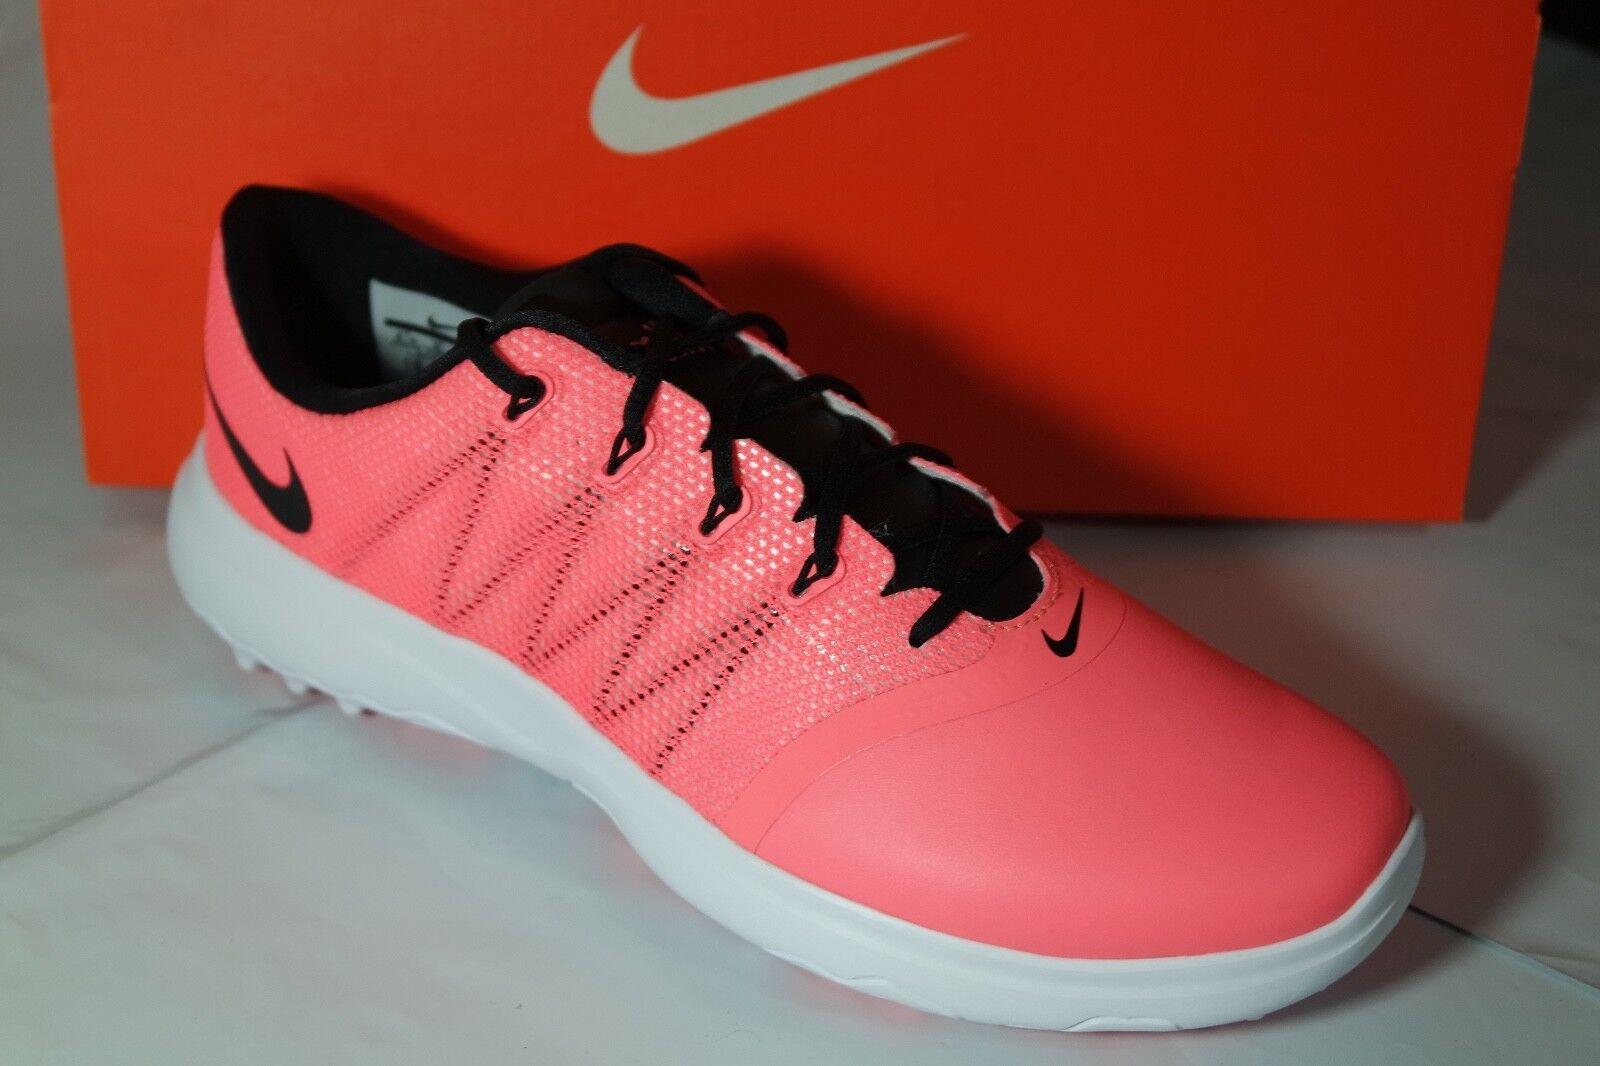 832dfe9d7119 Buy Nike Lunar Empress 2 Womens Size 9 Golf Shoes Lava Black White ...